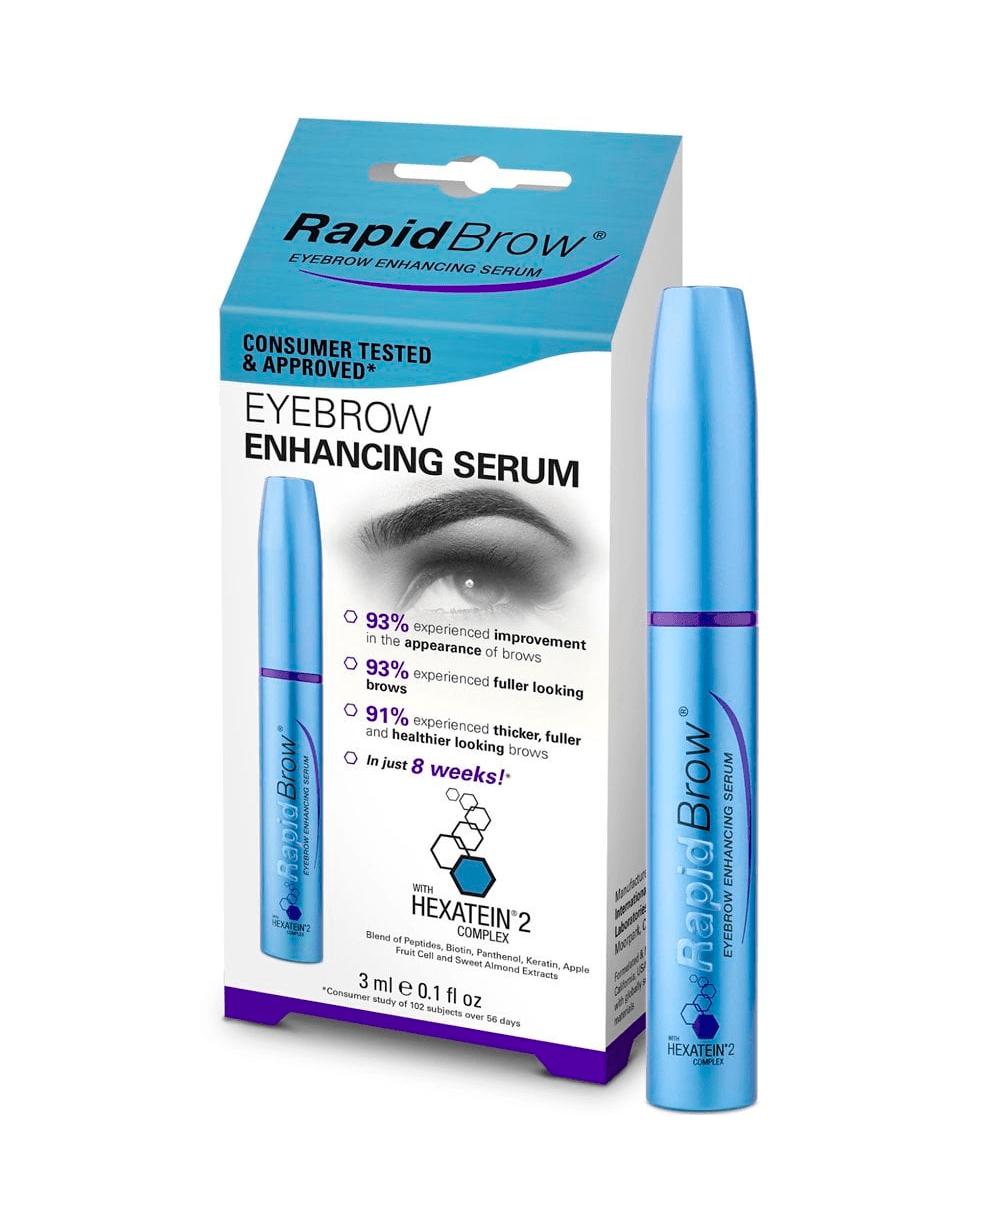 RapidBrow Eyebrow Enhancing Serum 3 ml Tu Cruz Verde